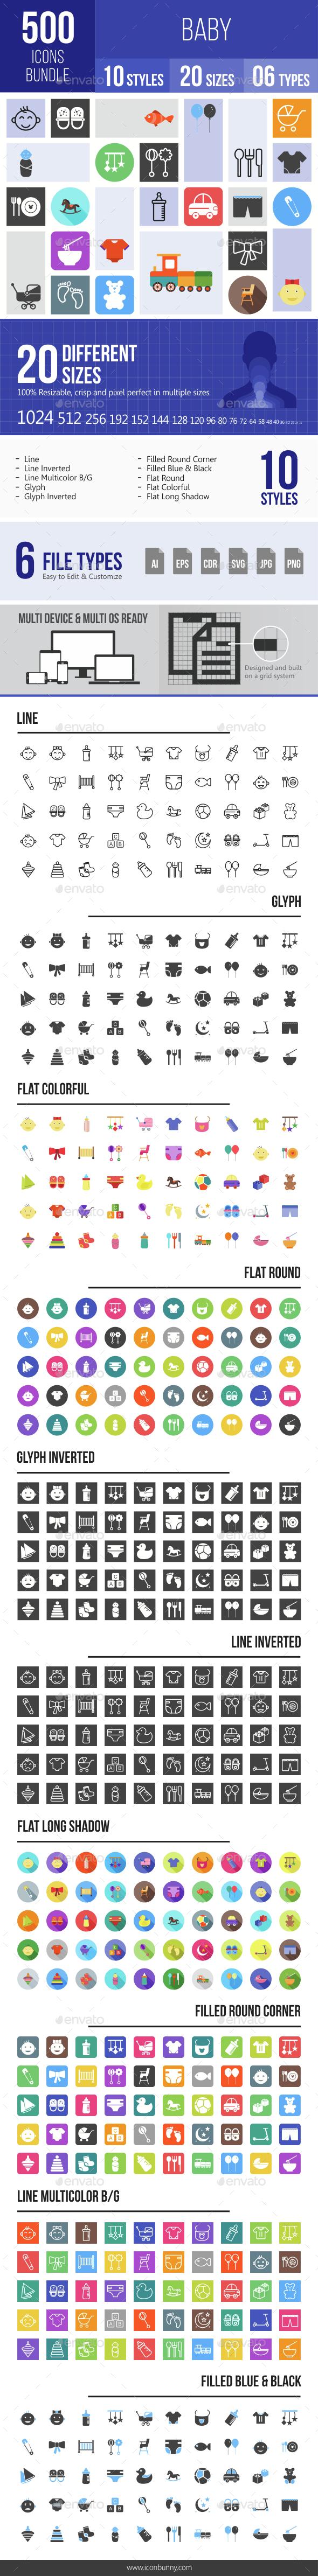 500 Baby Icons Bundle - Icons